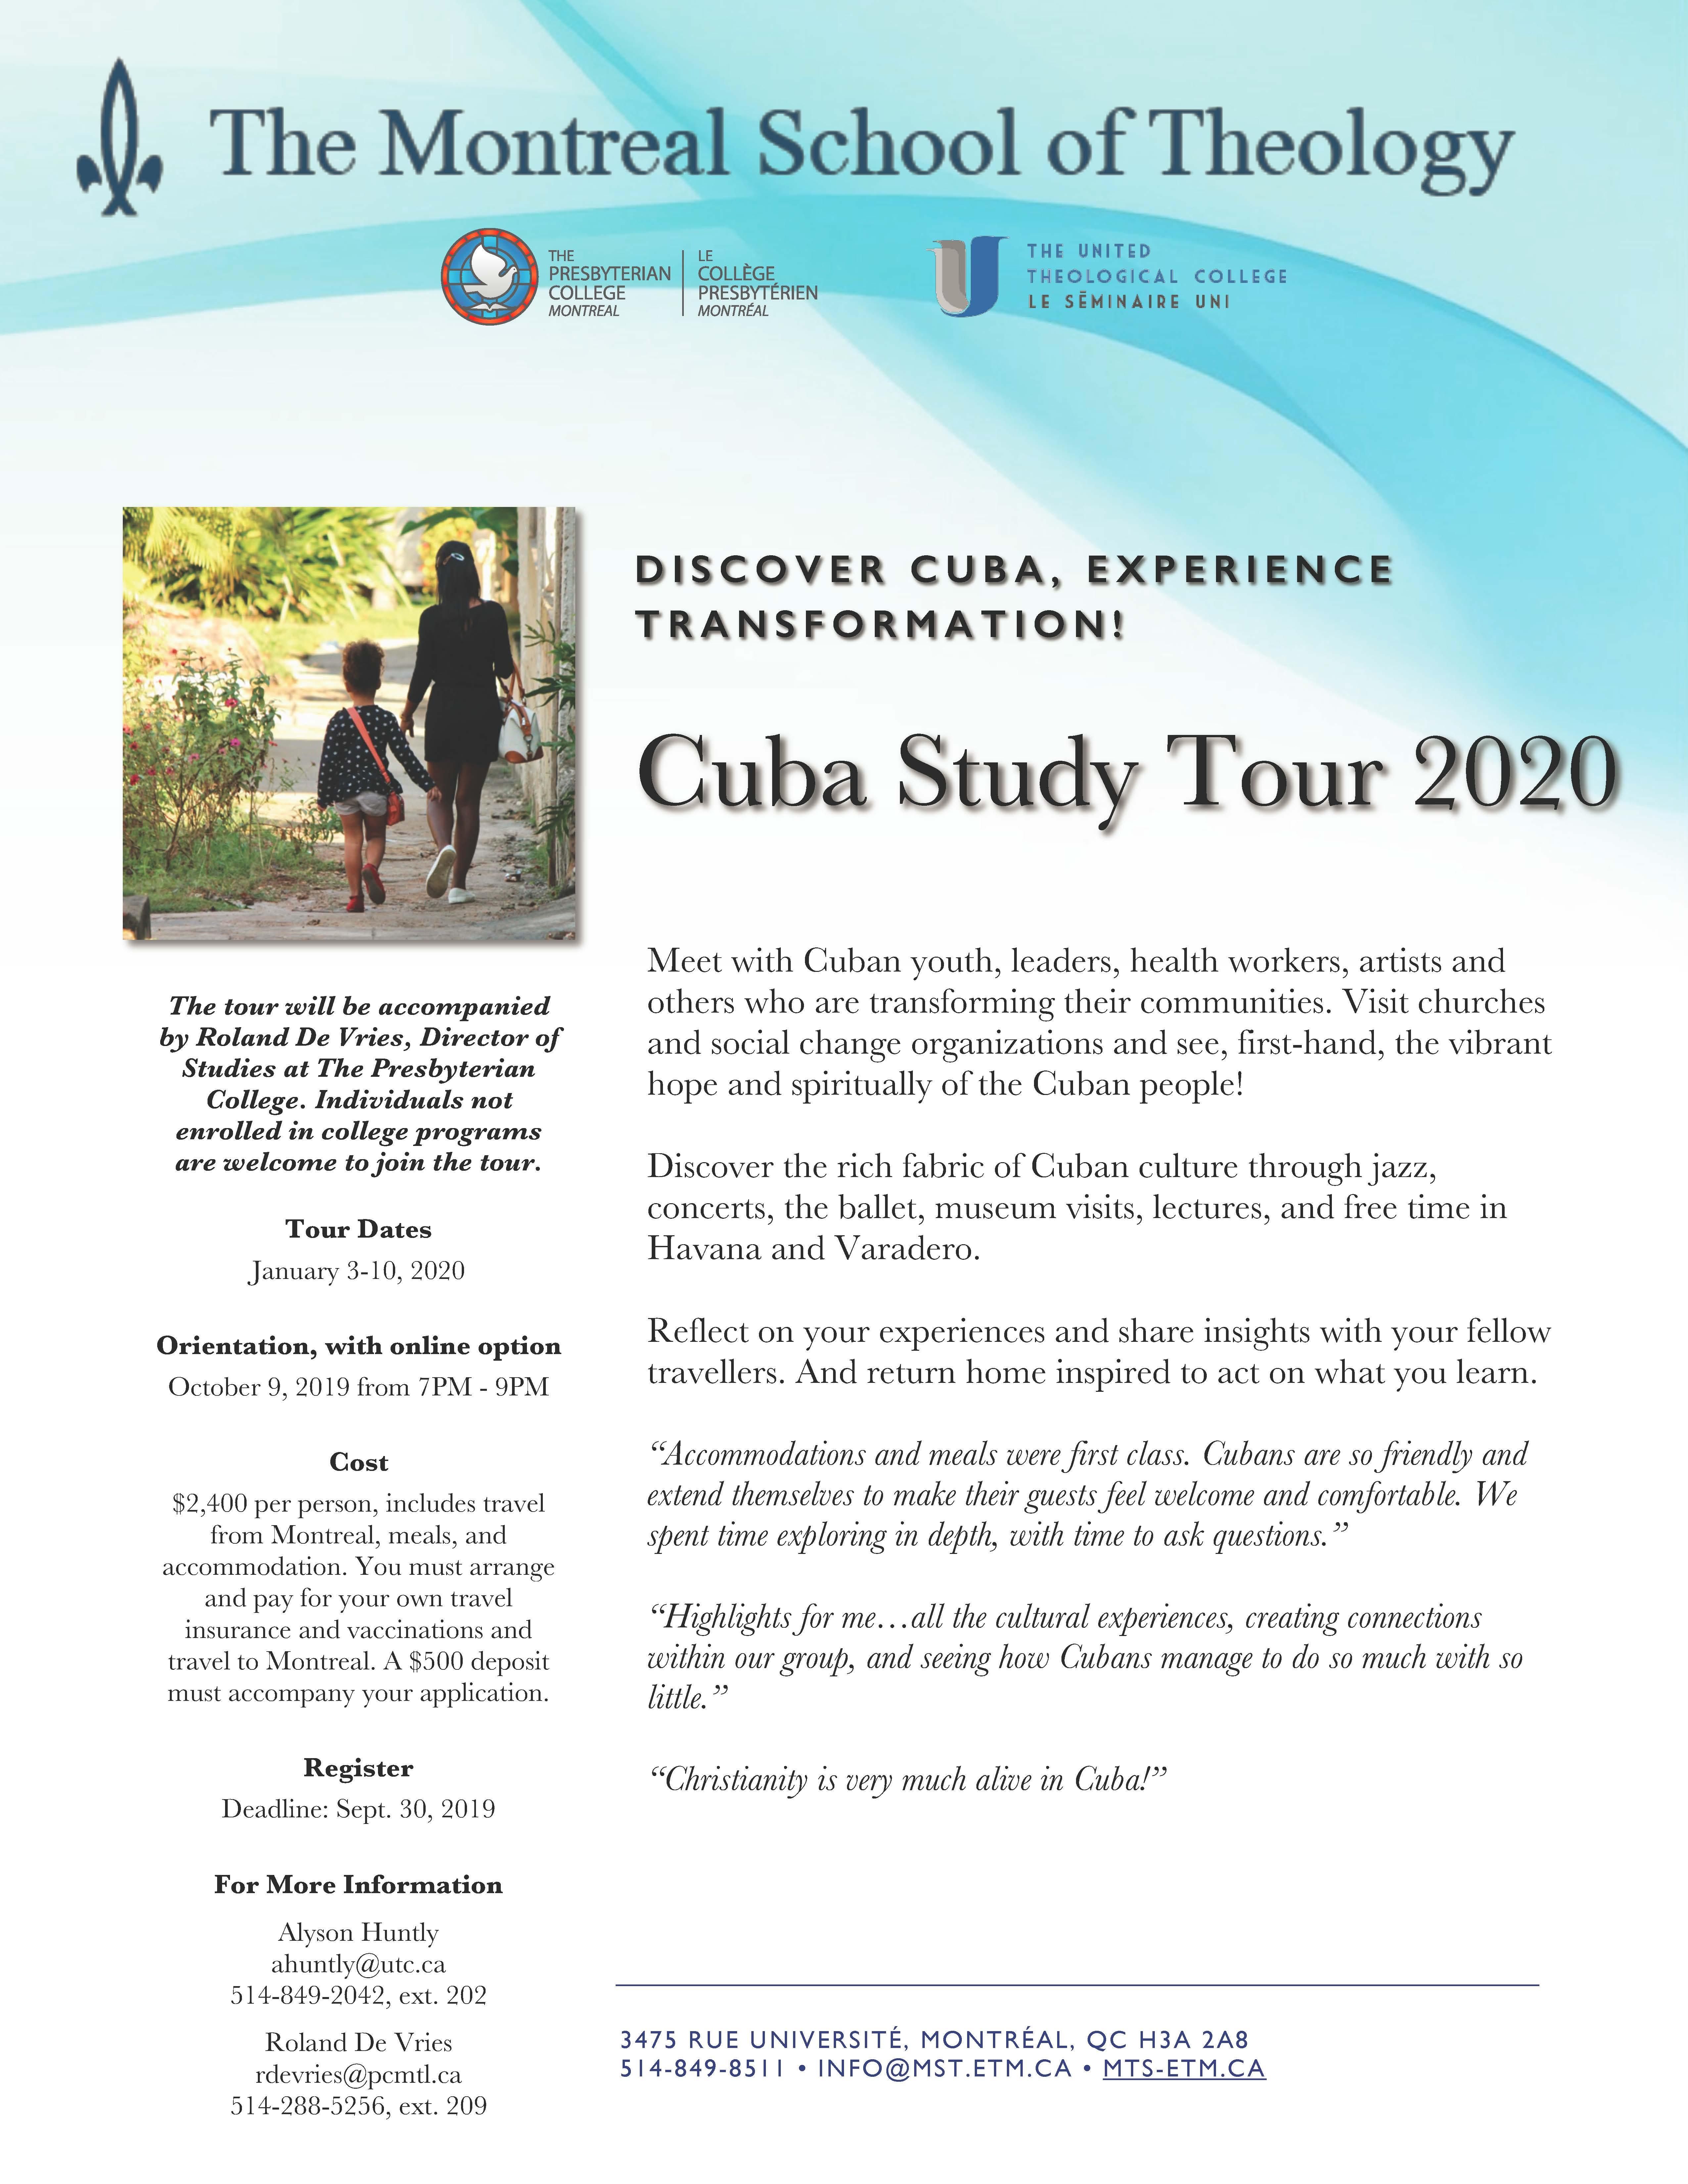 Cuba Study Tour 2020